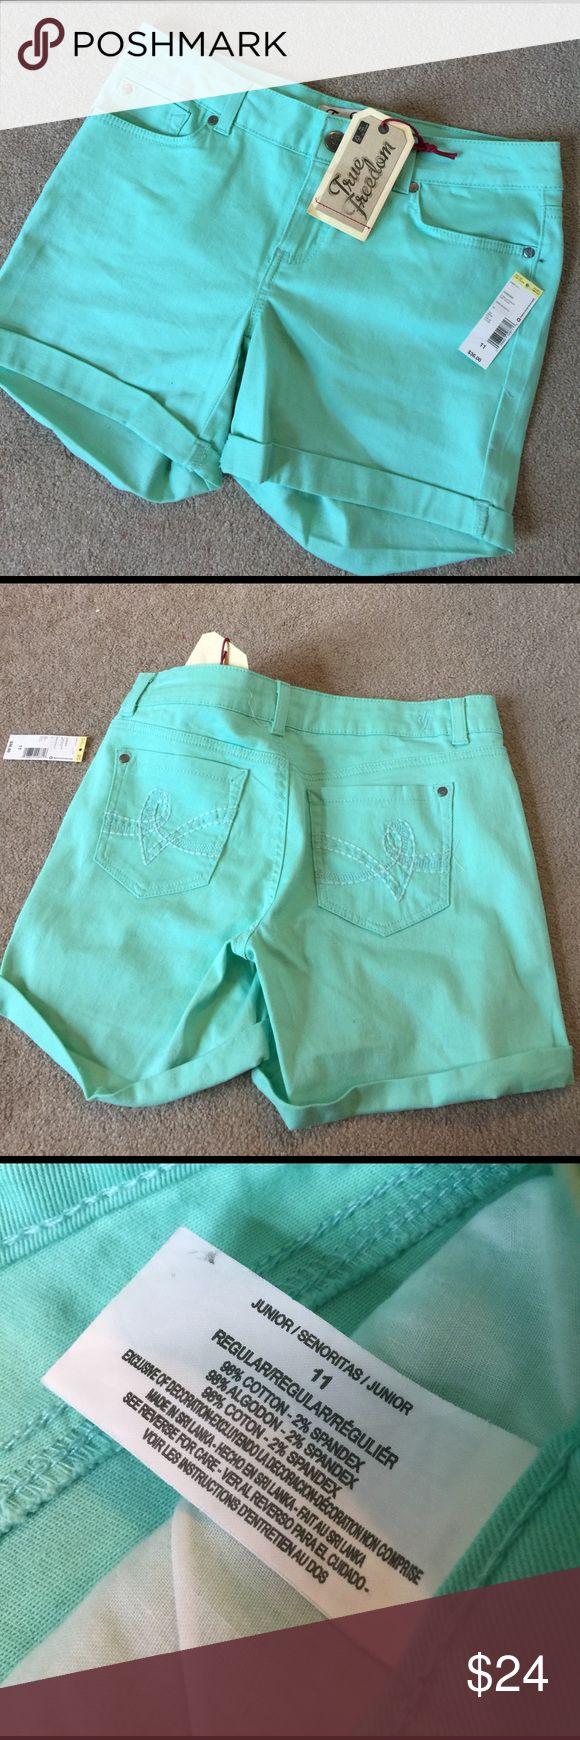 Mint green Jean shorts. Nwt 98% cotton 2% spandex. 4 1/2 inch inseam. A O True Freedom Shorts